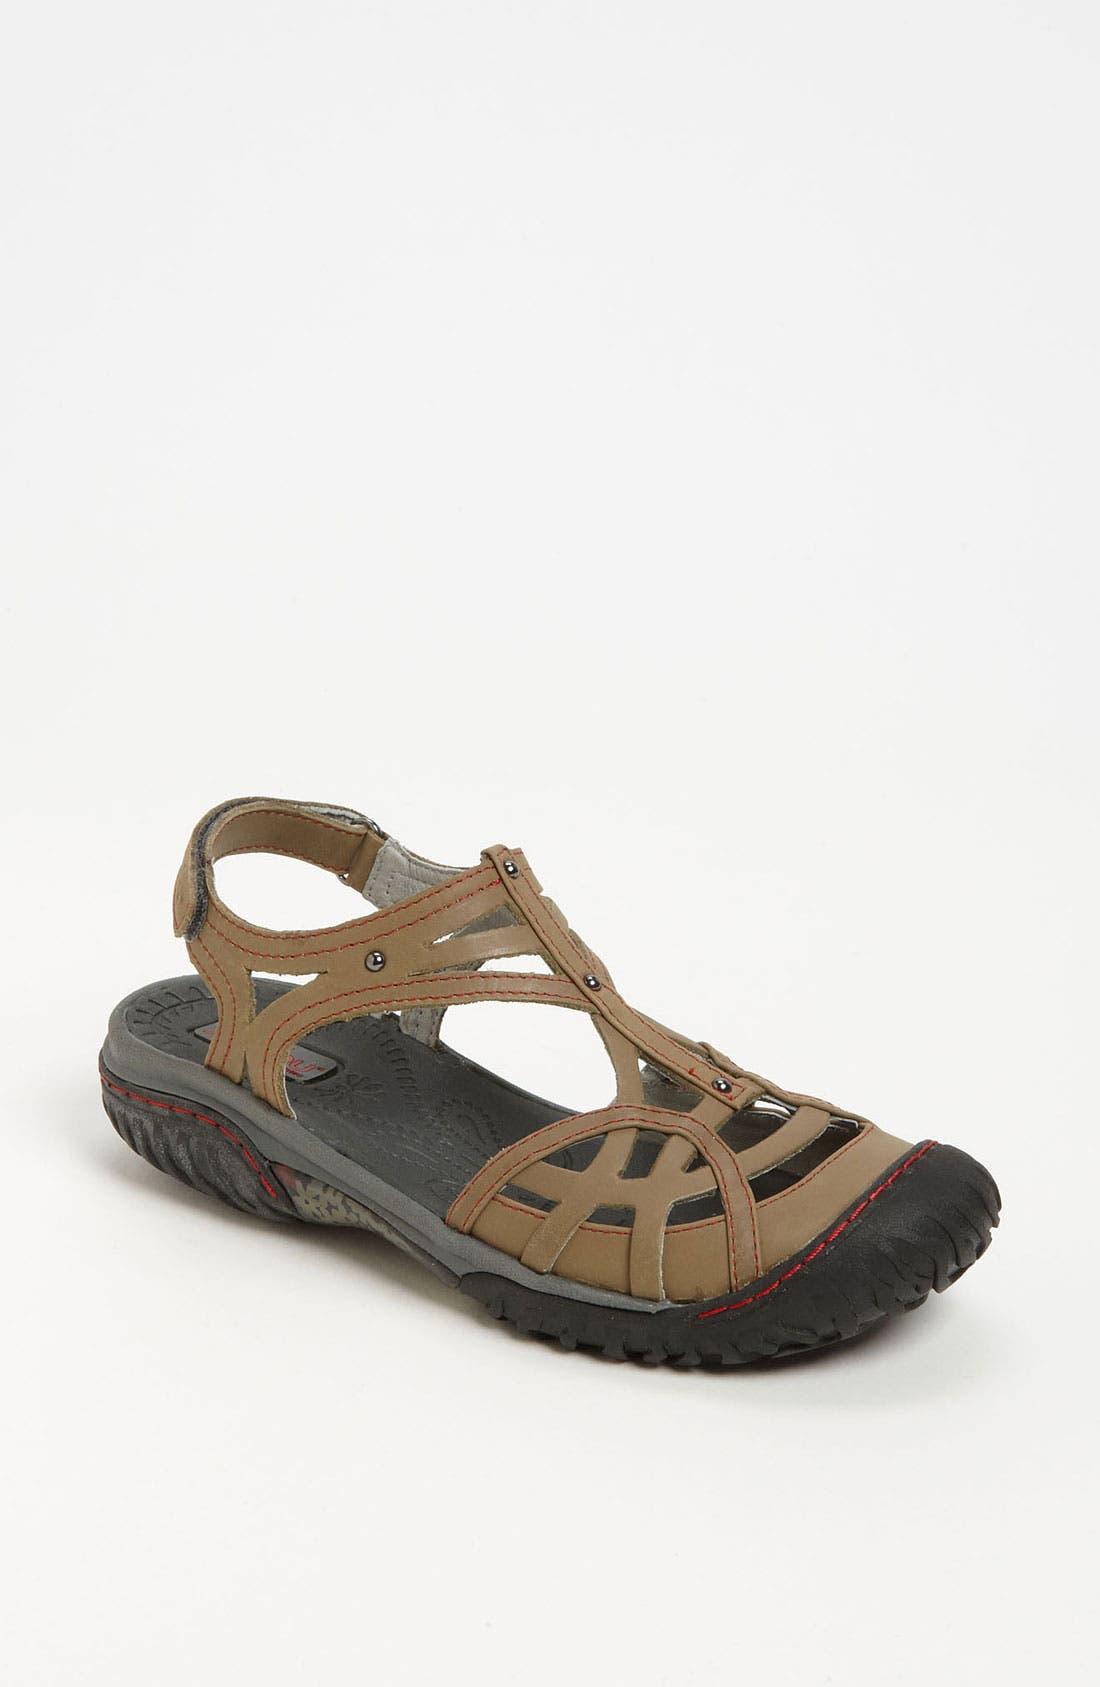 Alternate Image 1 Selected - Jambu 'All Terra Coconut' Sandal